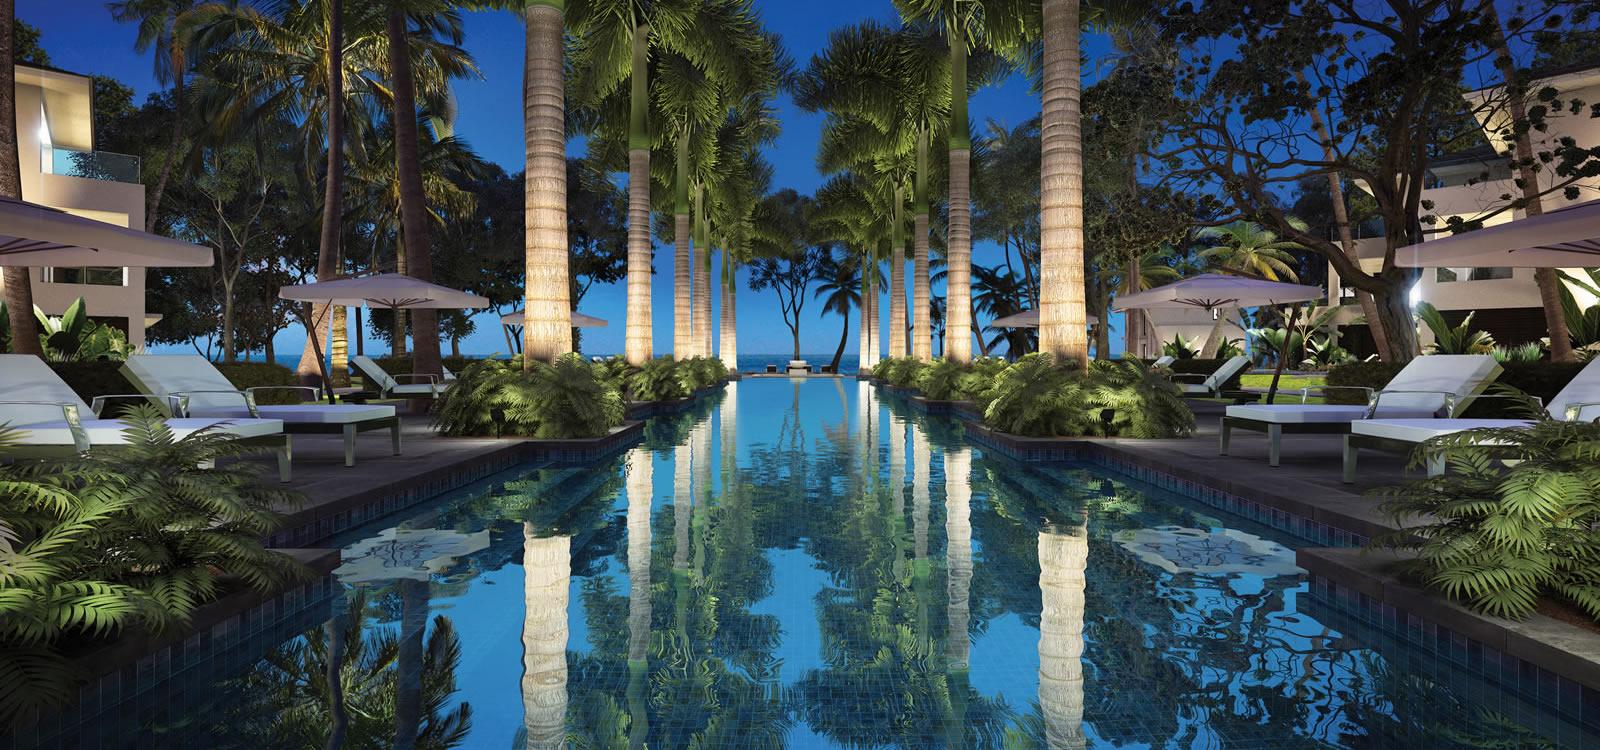 5 Bedroom Luxury Villas For Sale Holetown St James